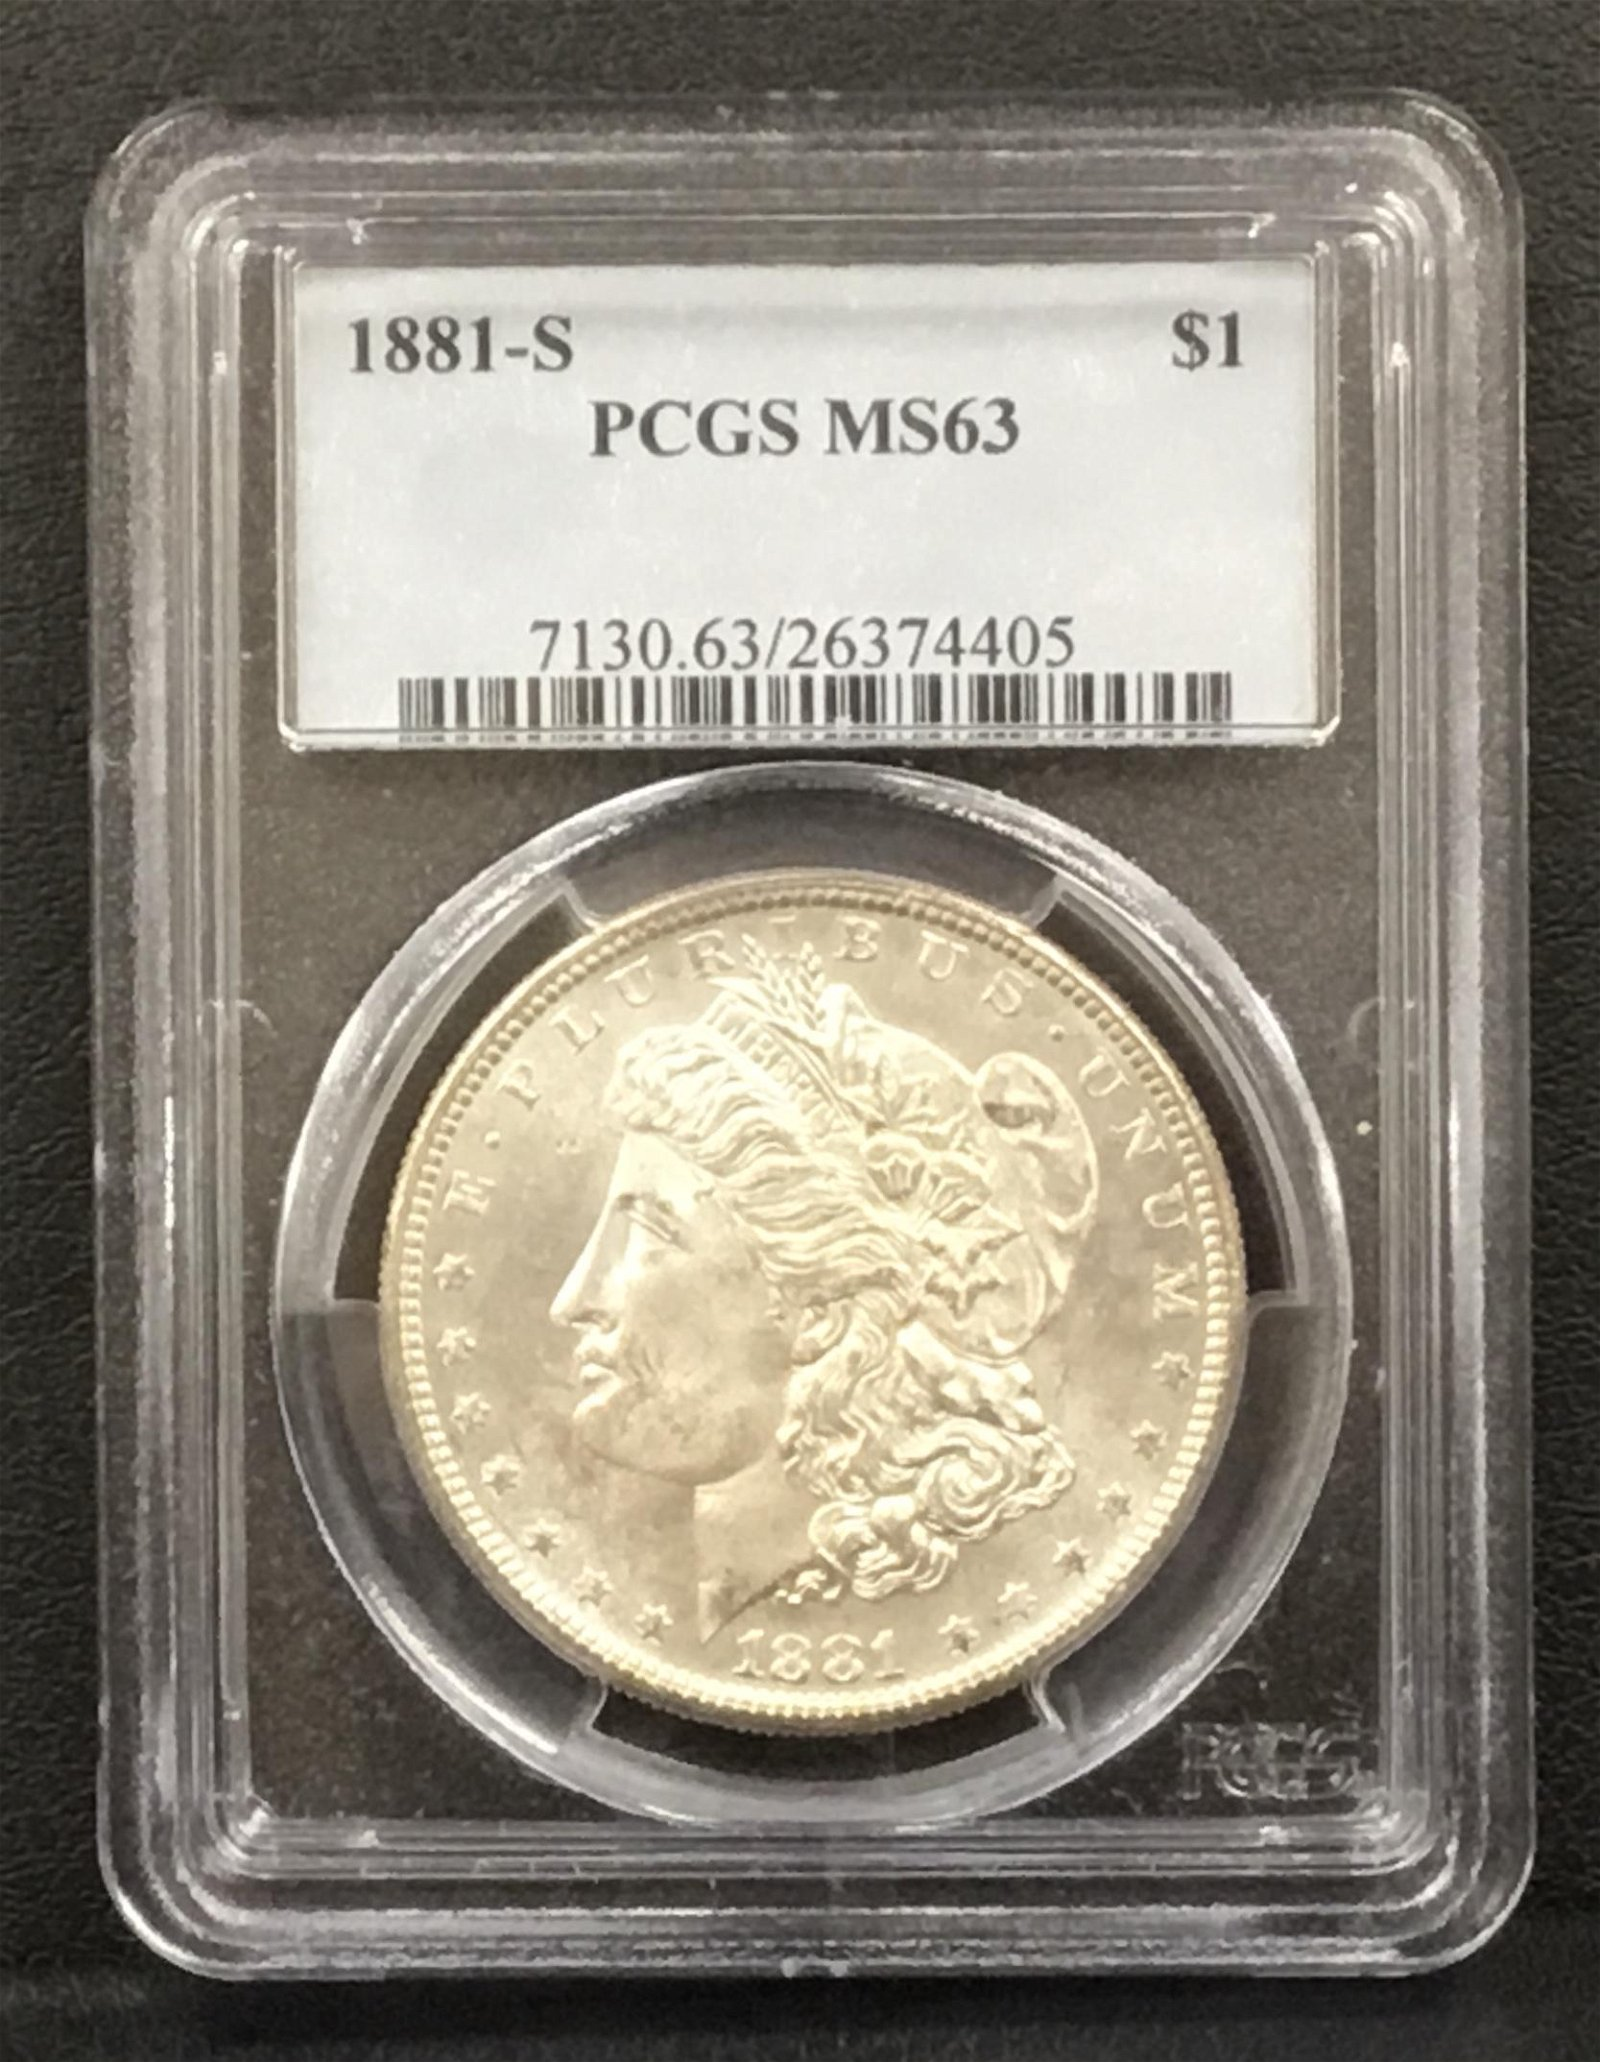 1881-S Morgan Silver Dollar - $1